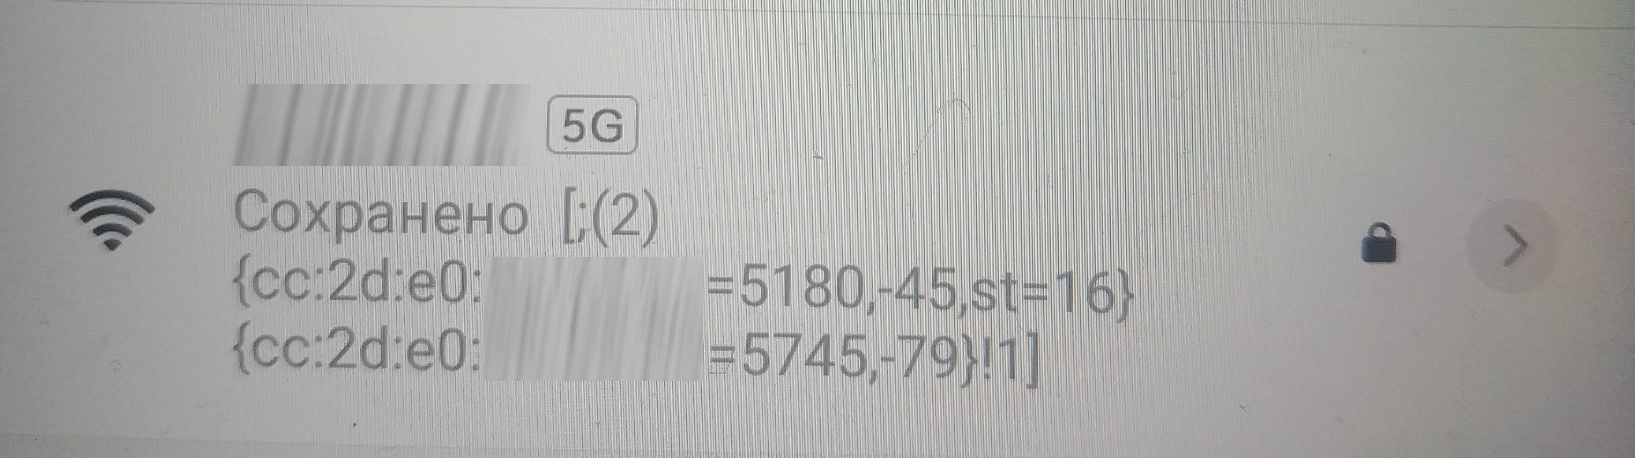 5e84cd691e755628844987.png